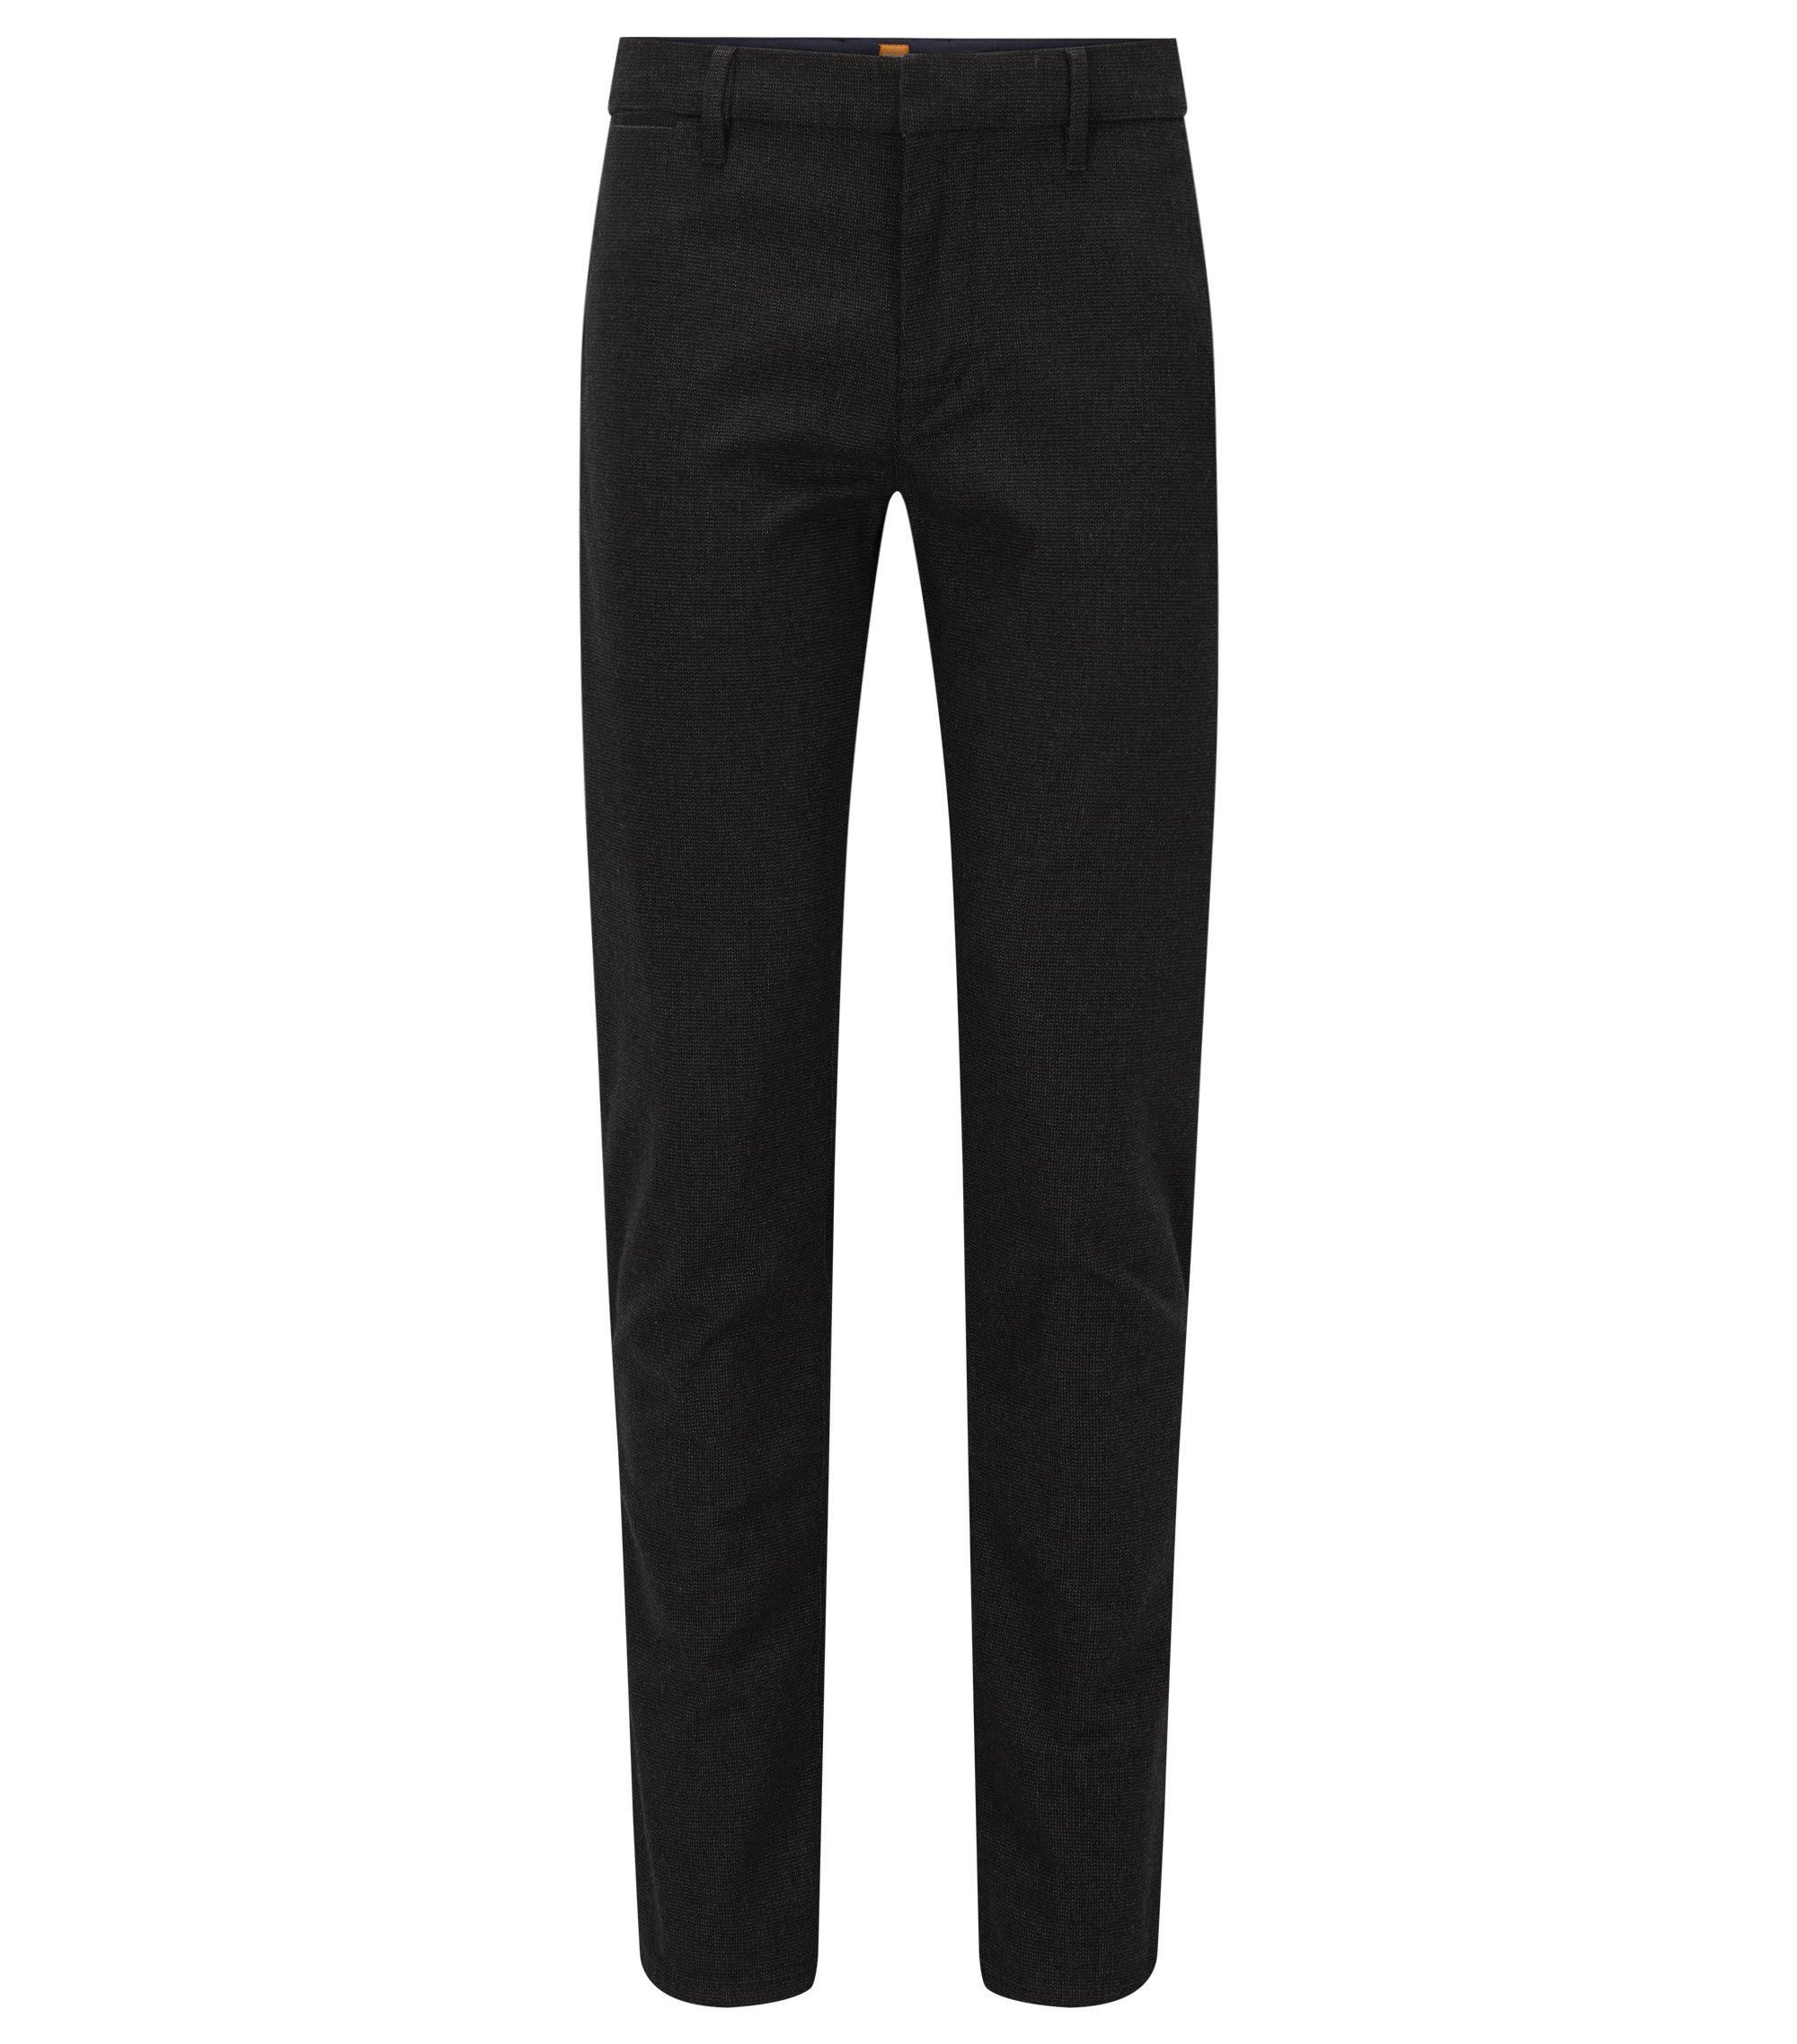 Stretch Cotton Pant, Slim Fit | Slim W, Black